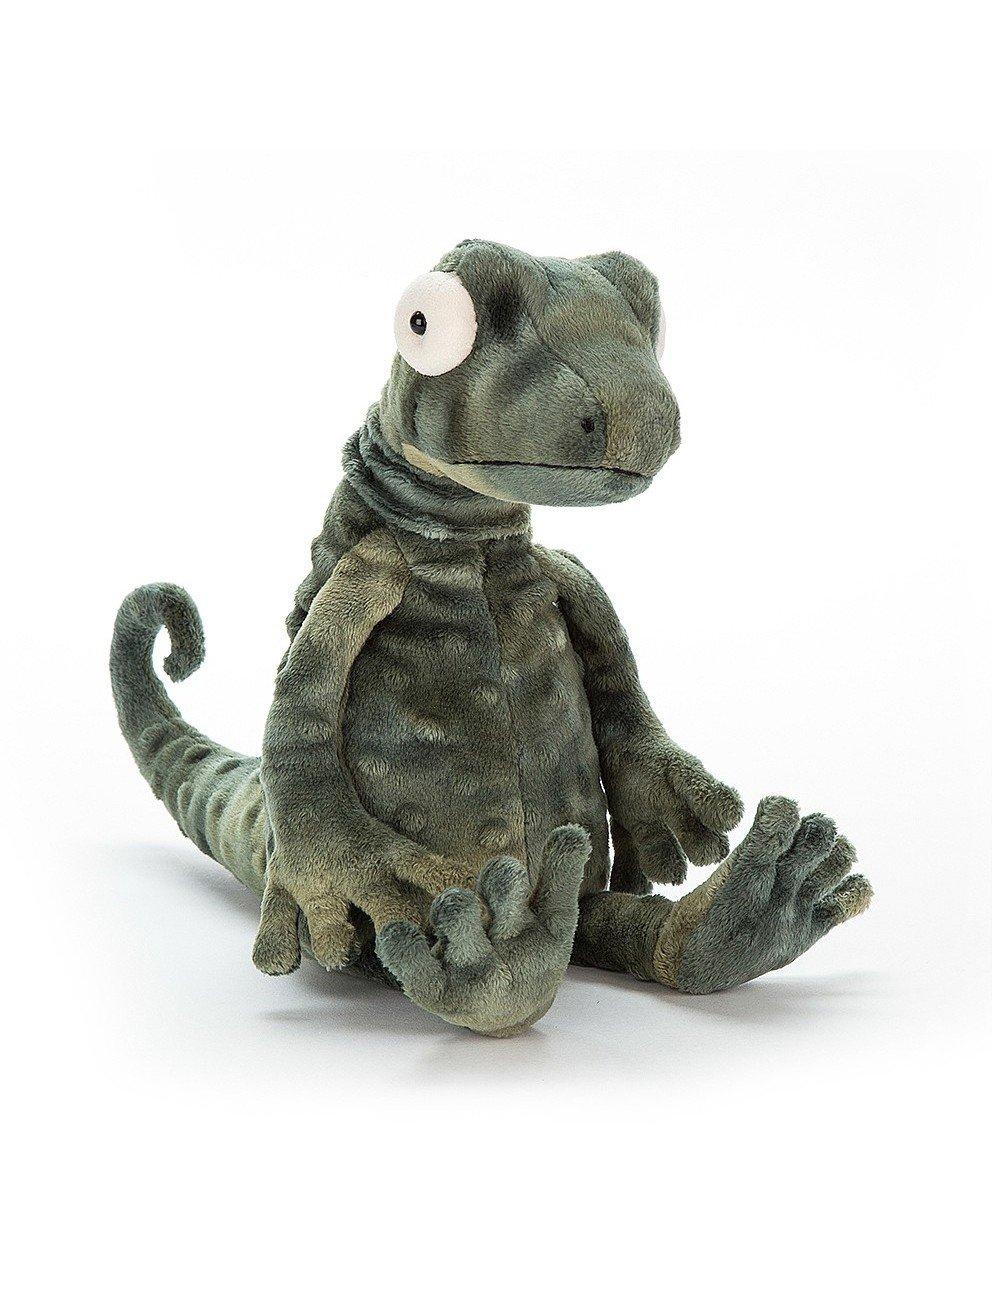 Jellycat - Gary GeckoぬいぐるみSoft ge3gg)   B0796LZWLC